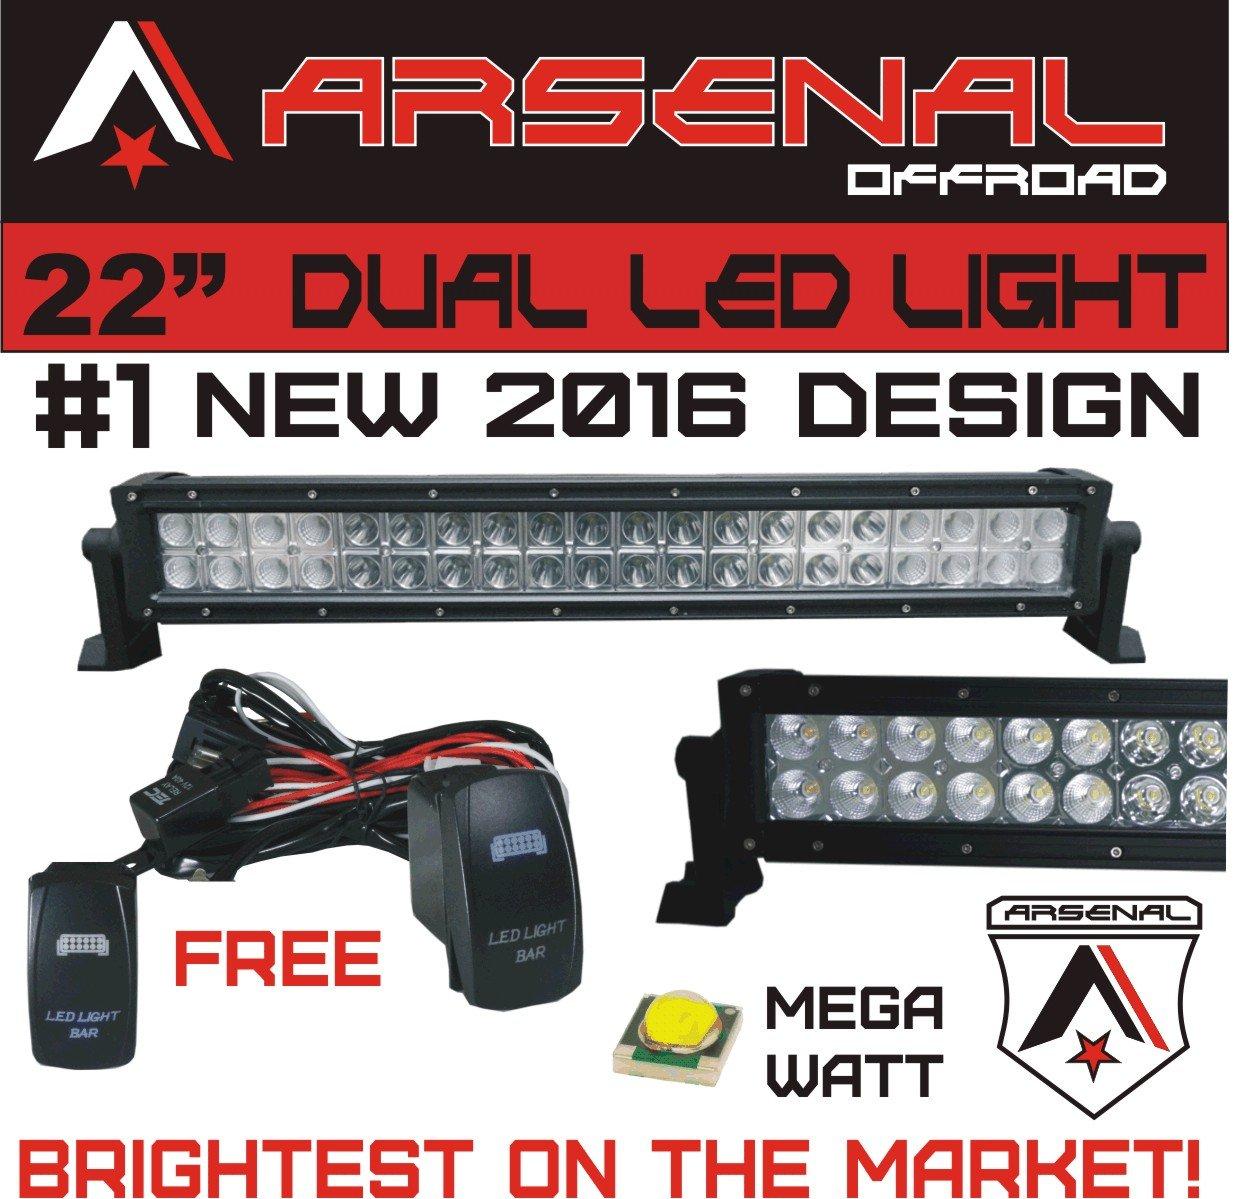 Arsenal Offroad Tm 40 Amp Relay 30amp Fuse Laser Blue Off Road Led Lights With Wiring Harness 1 2016 22 Mega Watt Light Bar 20 Of Leds